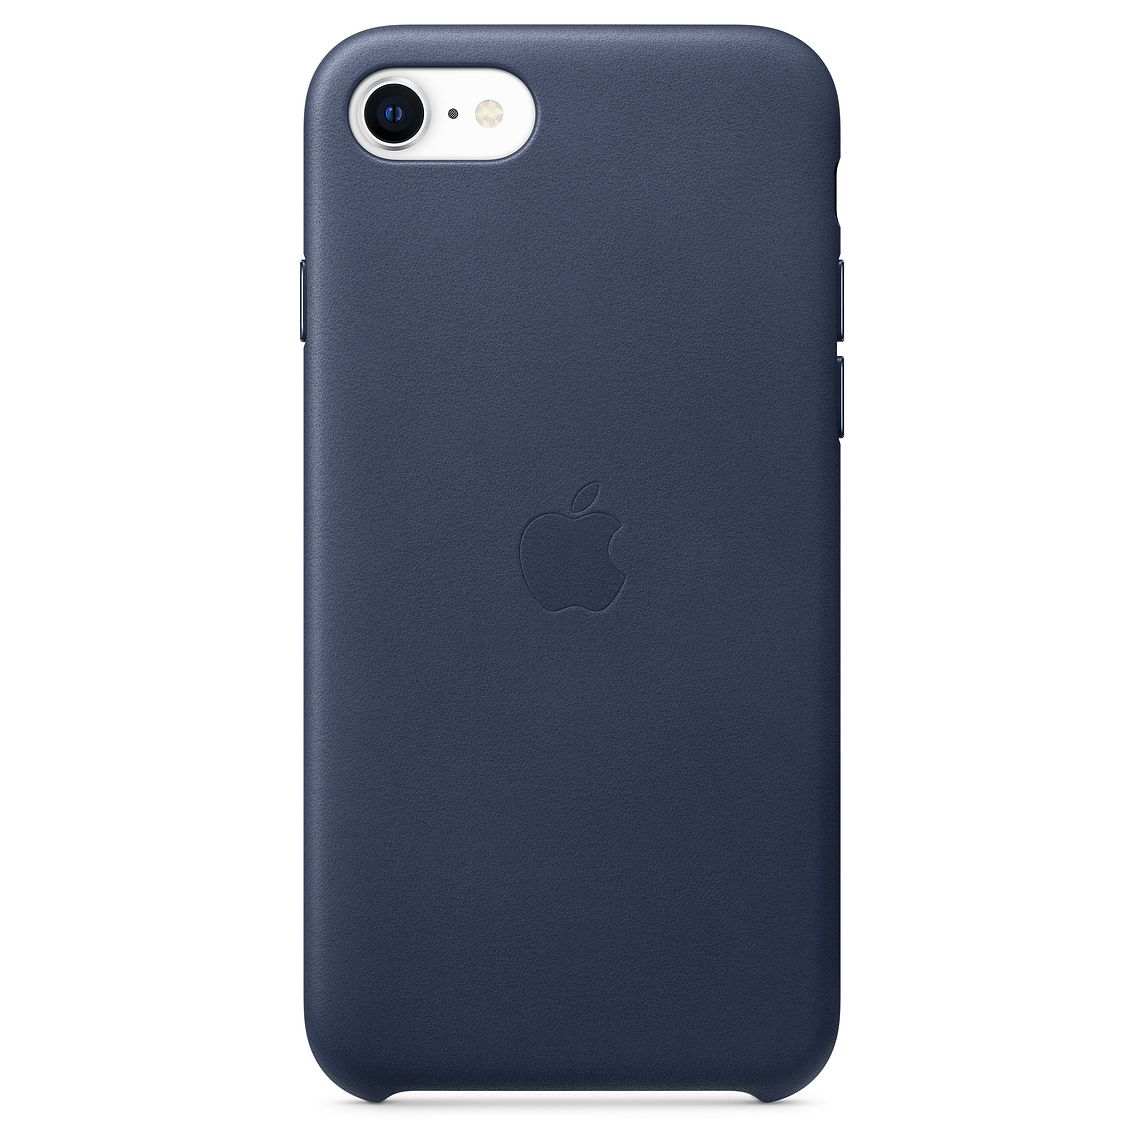 Apple iPhone SE Leather Case Midnight Blue (2020)